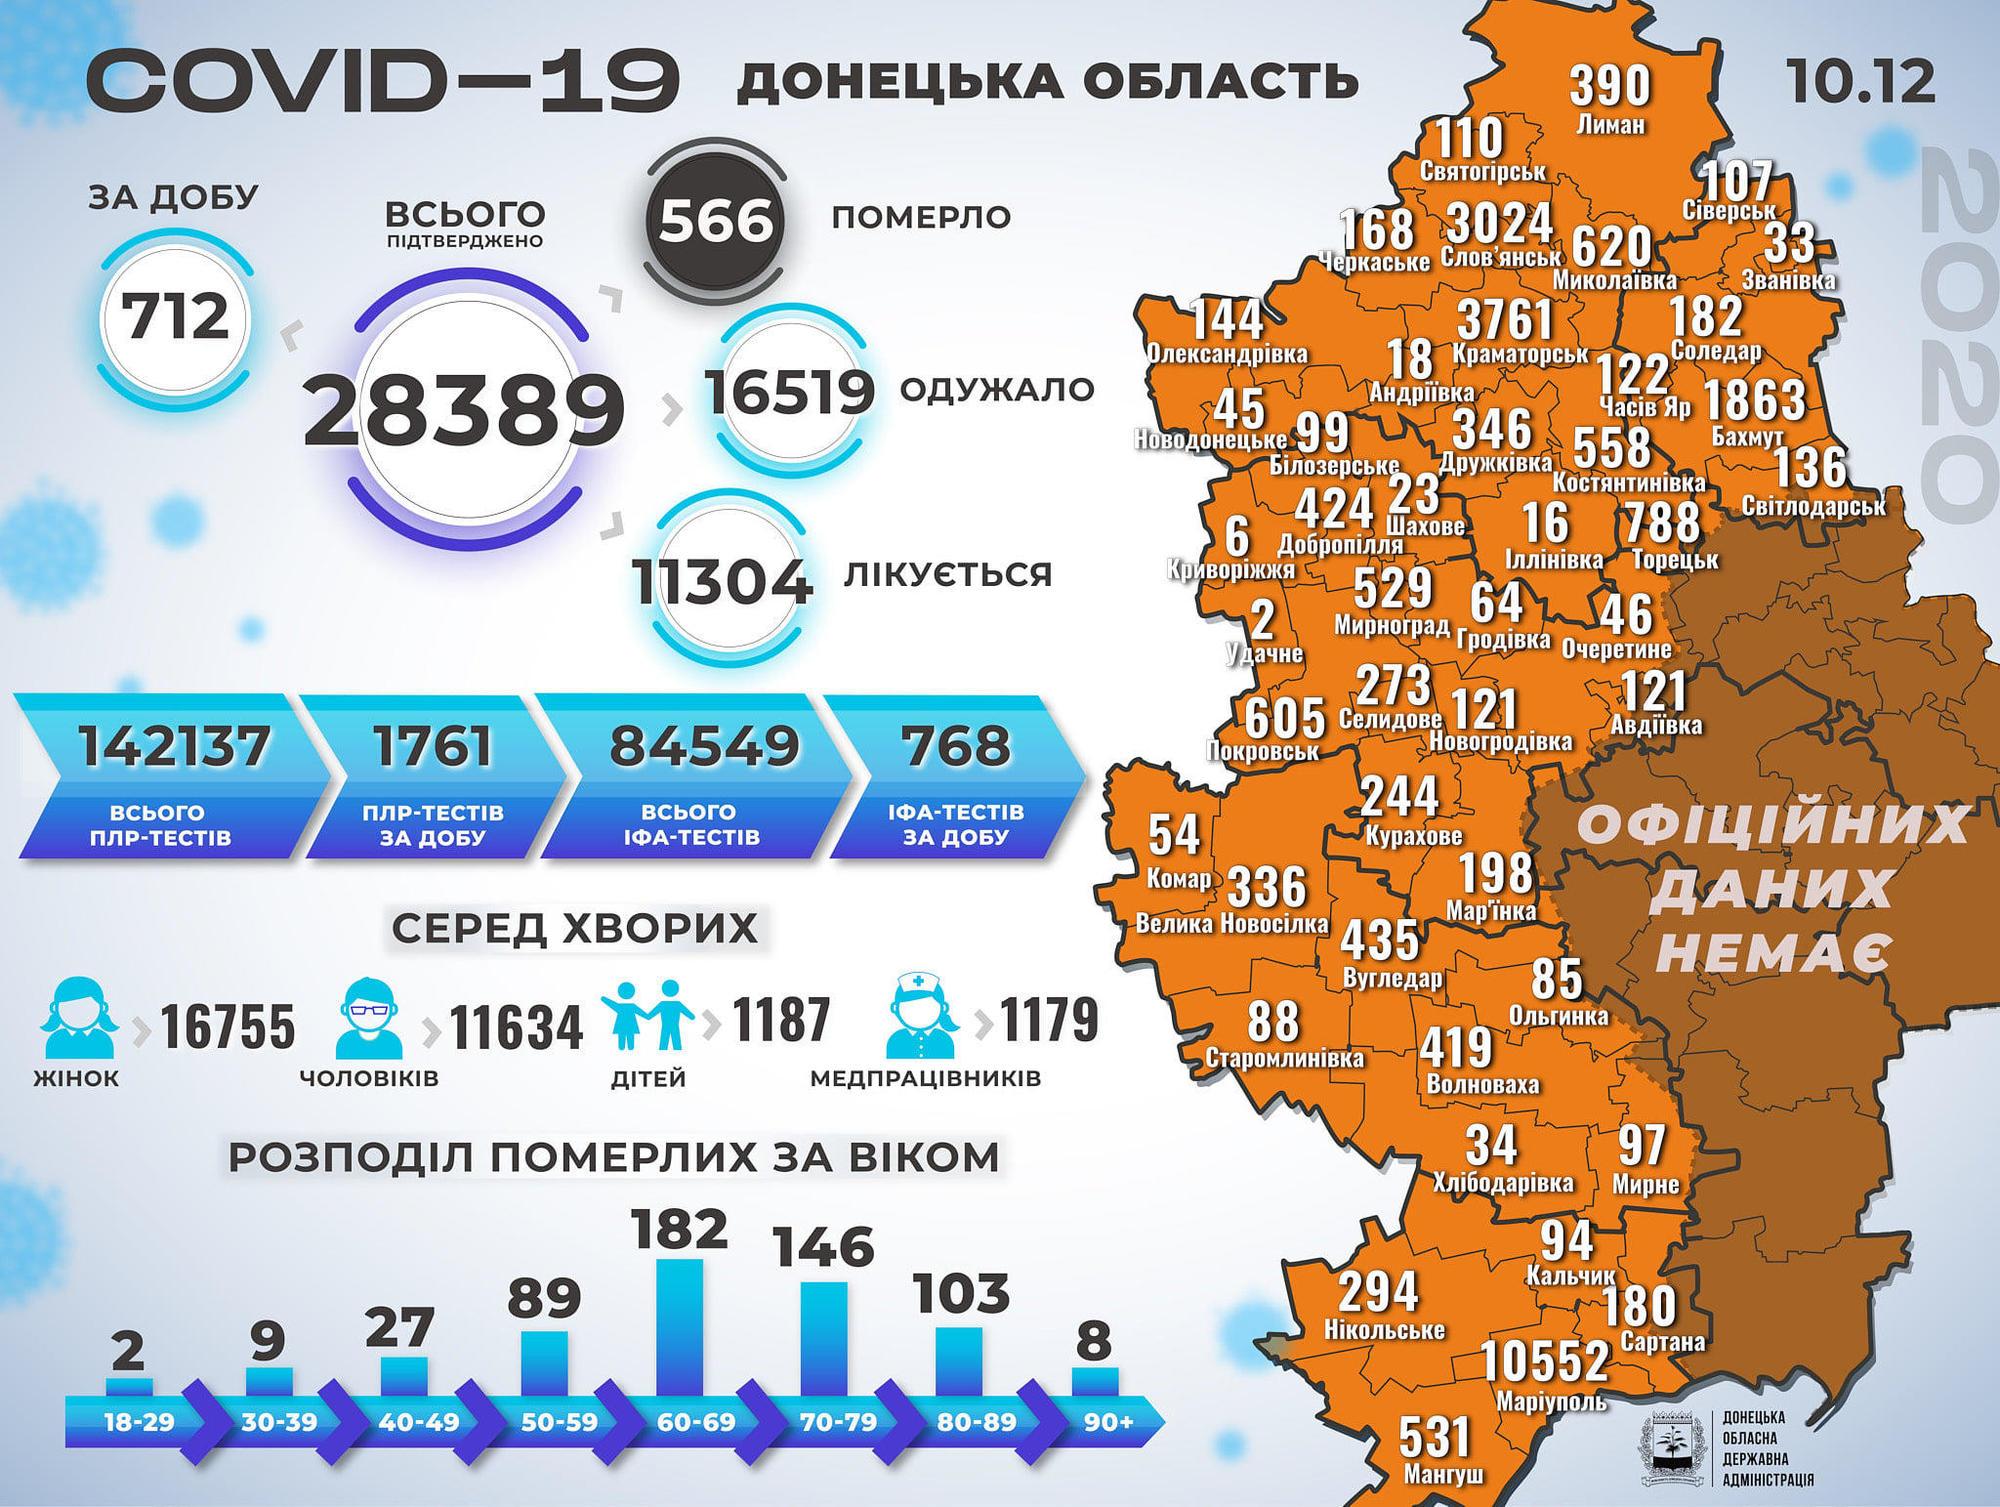 COVID-19: на Донетчине за день добавилось более 700 пациентов с коронавирусом